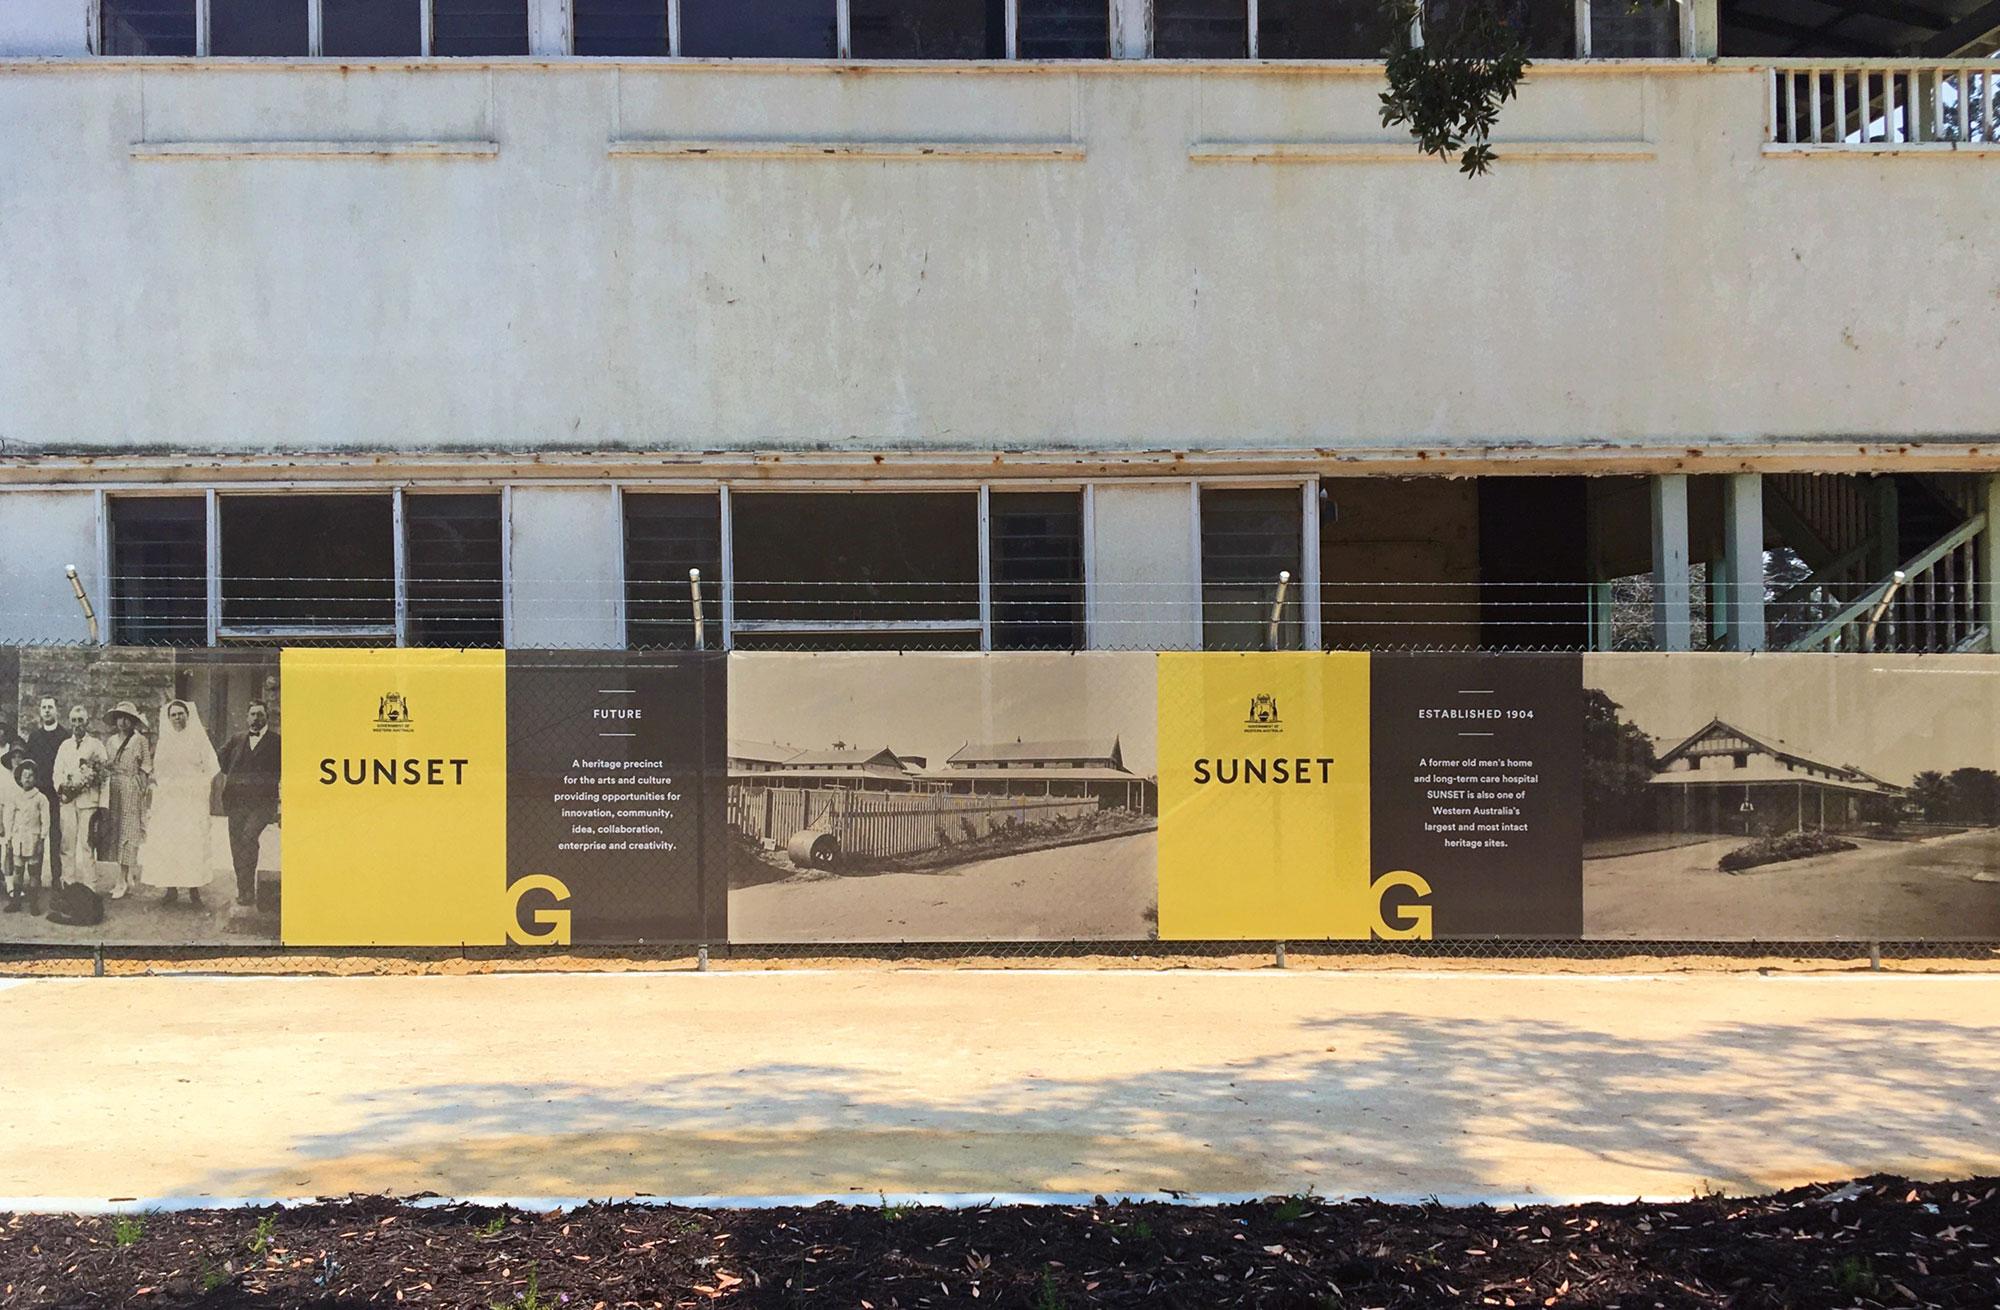 Sunset Heritage Precinct – Hoarding